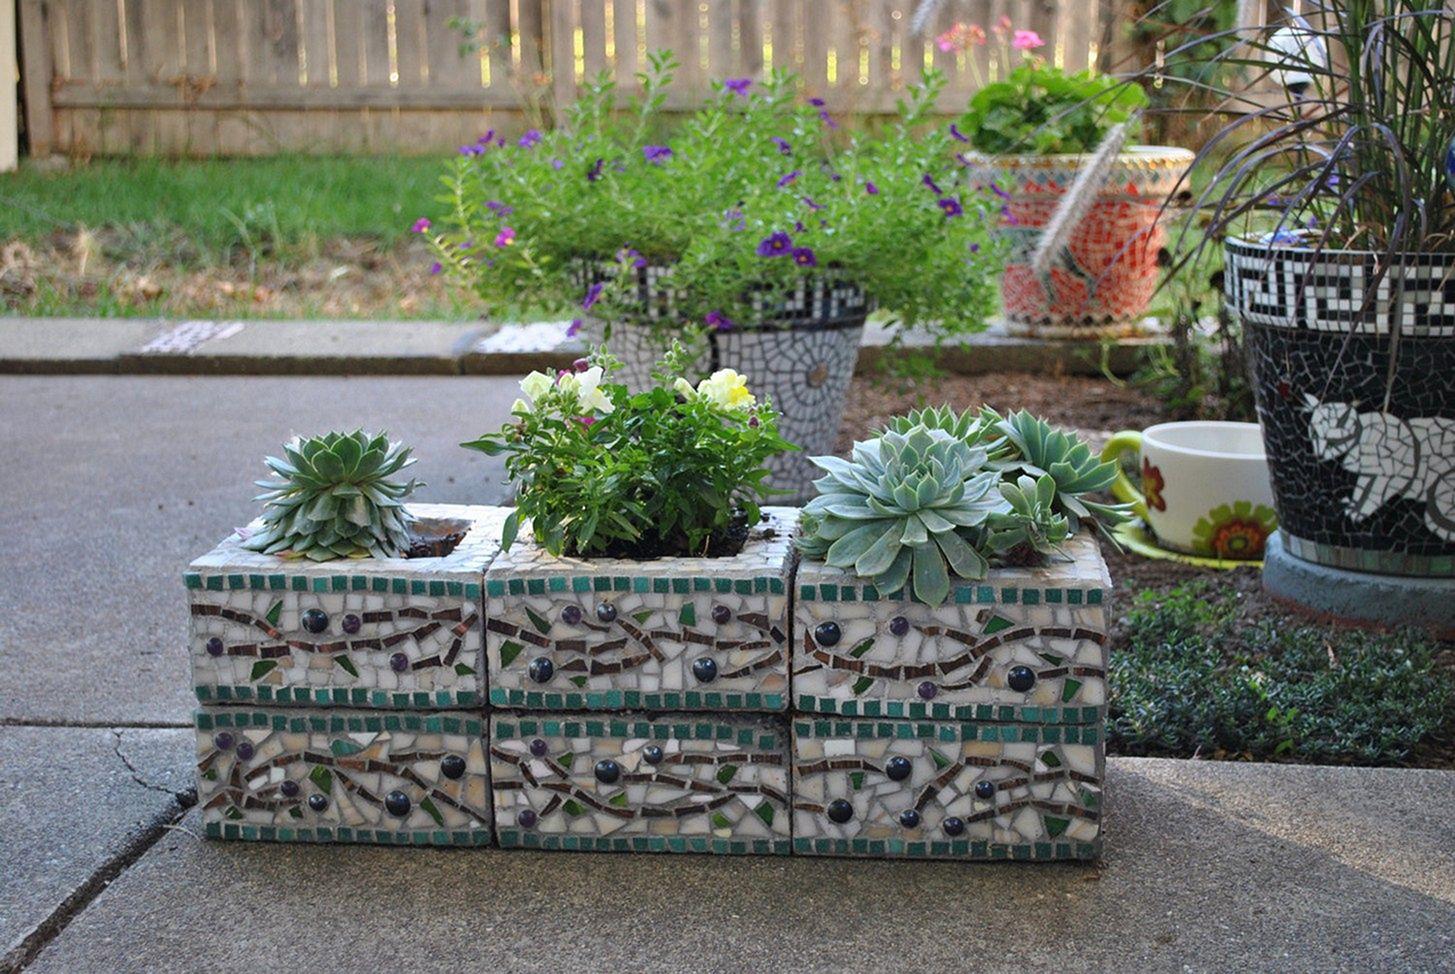 Cinder Block Garden Wall Ideas - DECOREDO on Backyard Cinder Block Wall Ideas id=44371